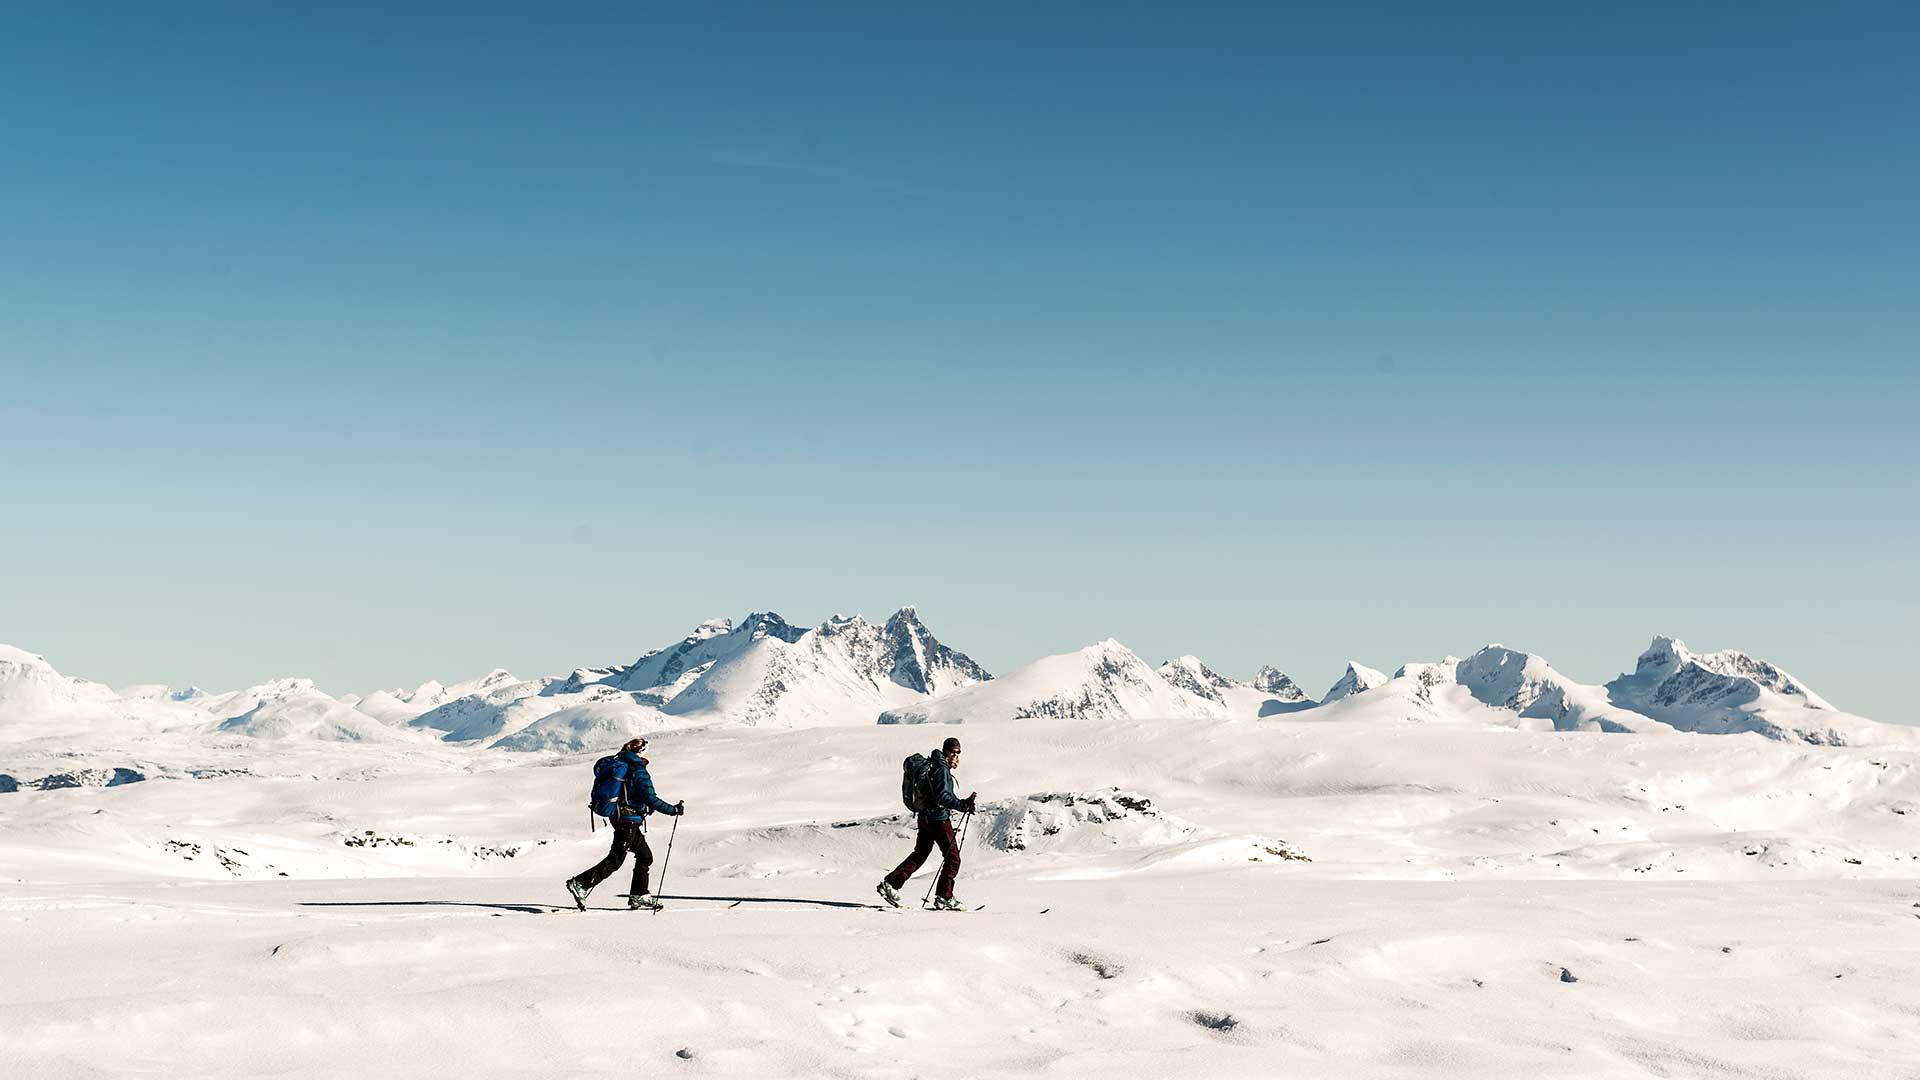 Two people skiing in Breheimen